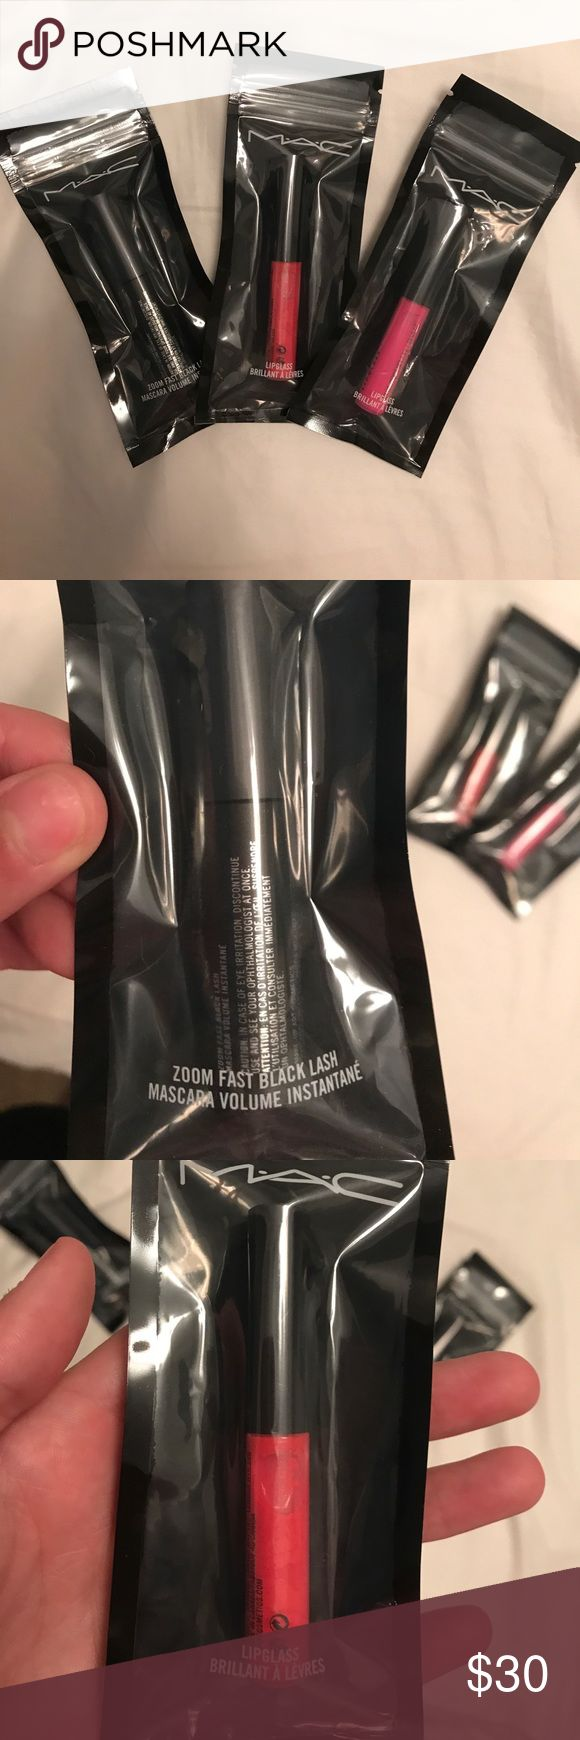 "MAC Sample Bundle 2 Lipglass samples in ""Short & Snappy"" & ""Candy Yum Yum"" & 1 Zoom Fast Black Lash mascara sample MAC Cosmetics Makeup"